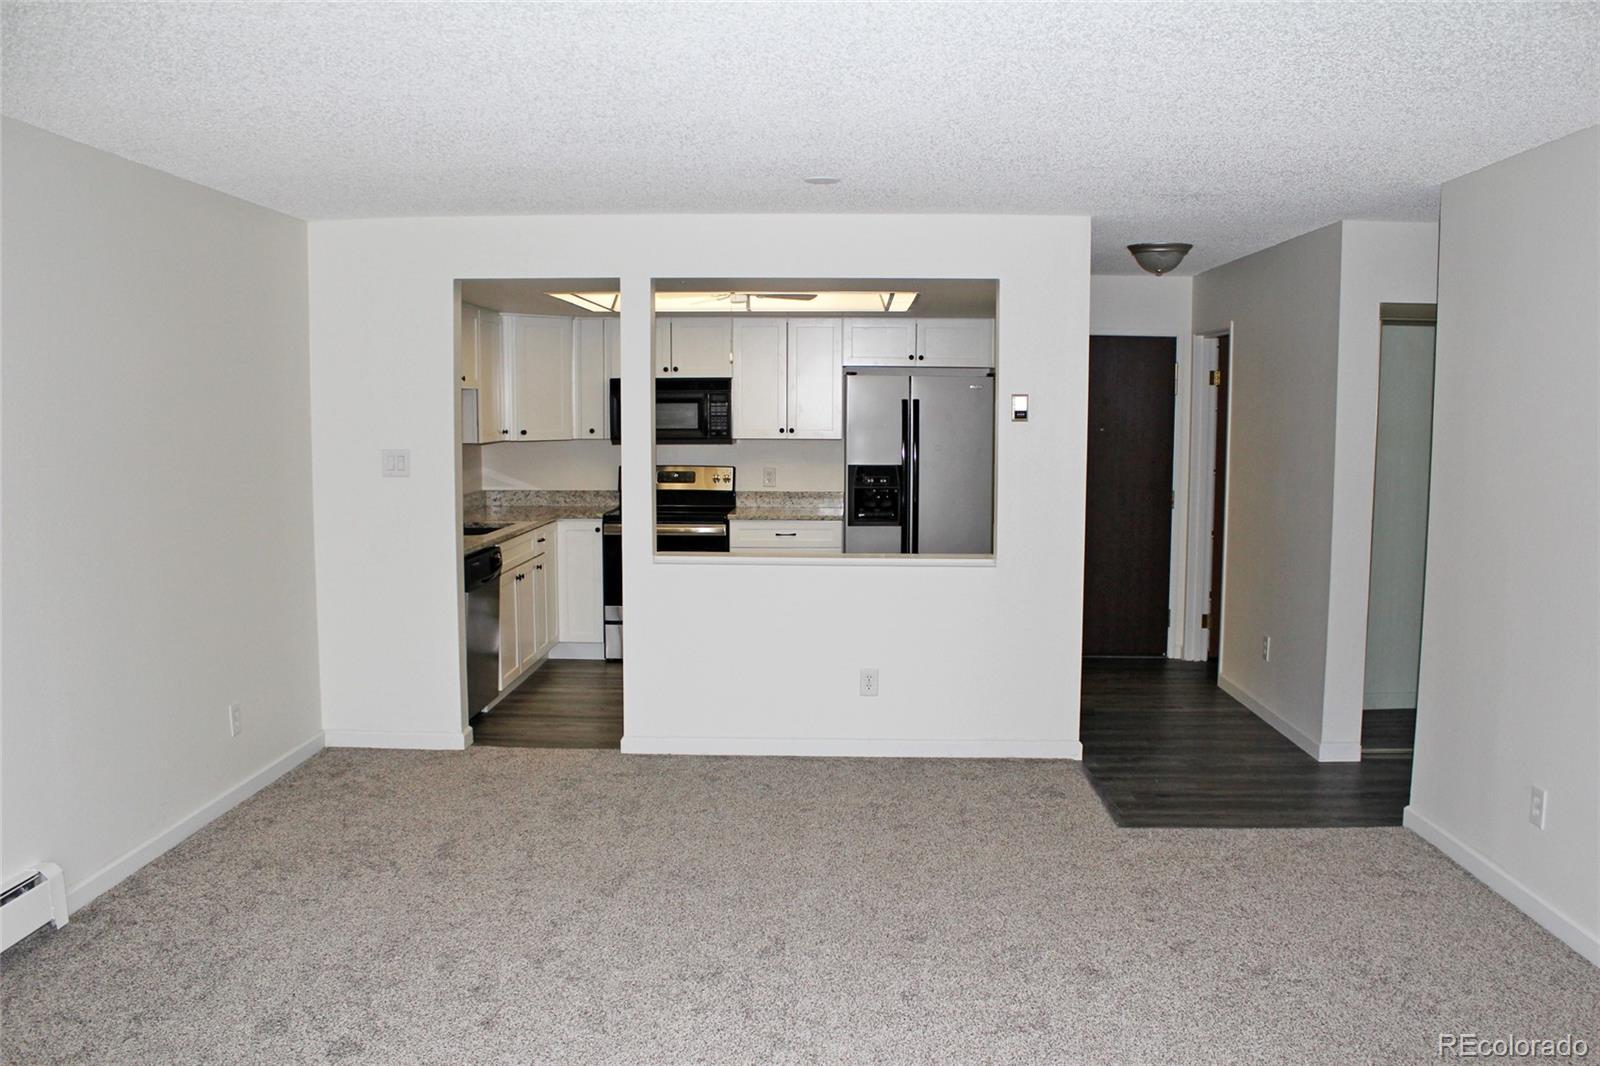 MLS# 9494855 - 3 - 13902 E Marina Drive #604, Aurora, CO 80014